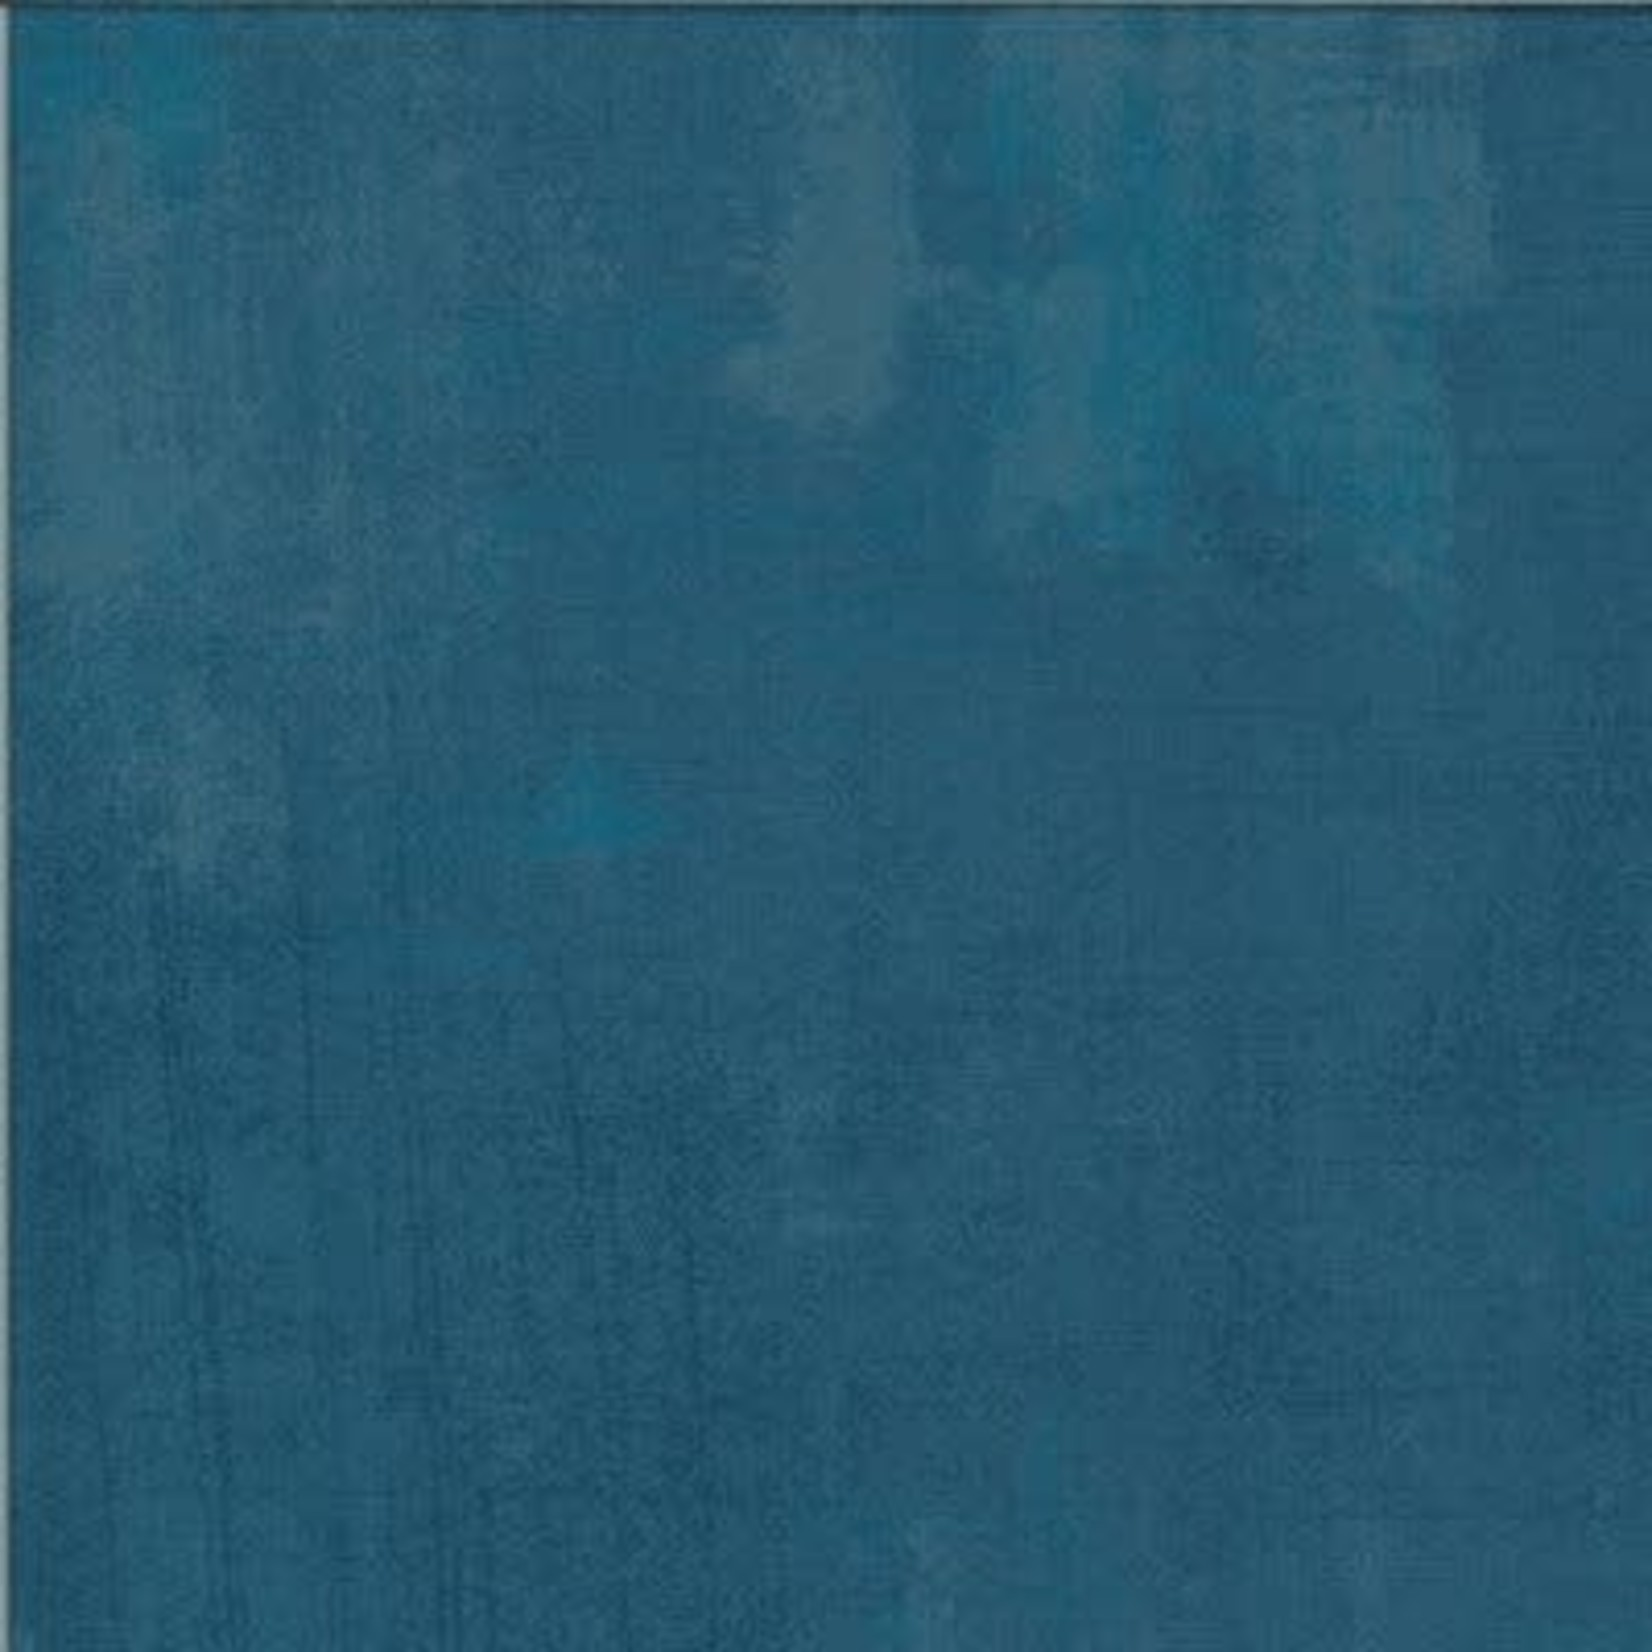 Moda Grunge Basics Grunge - Blueberry Buckle per cm or $20/m